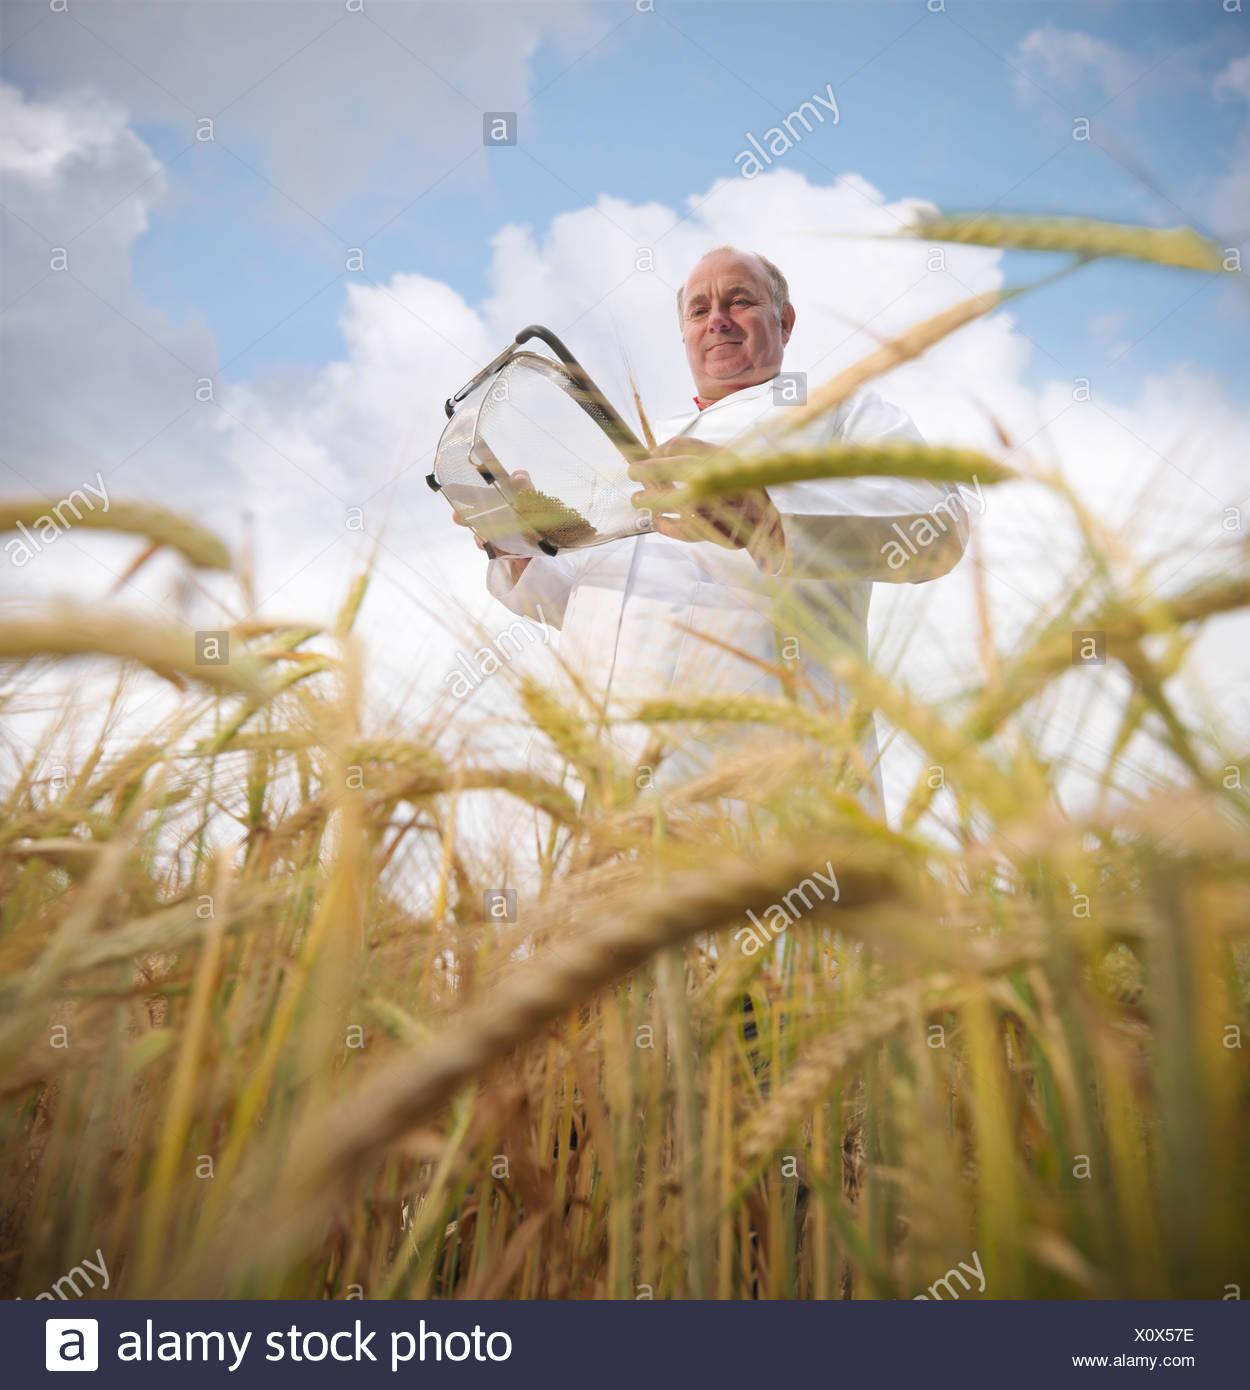 Scientist examining barley in field - Stock Image